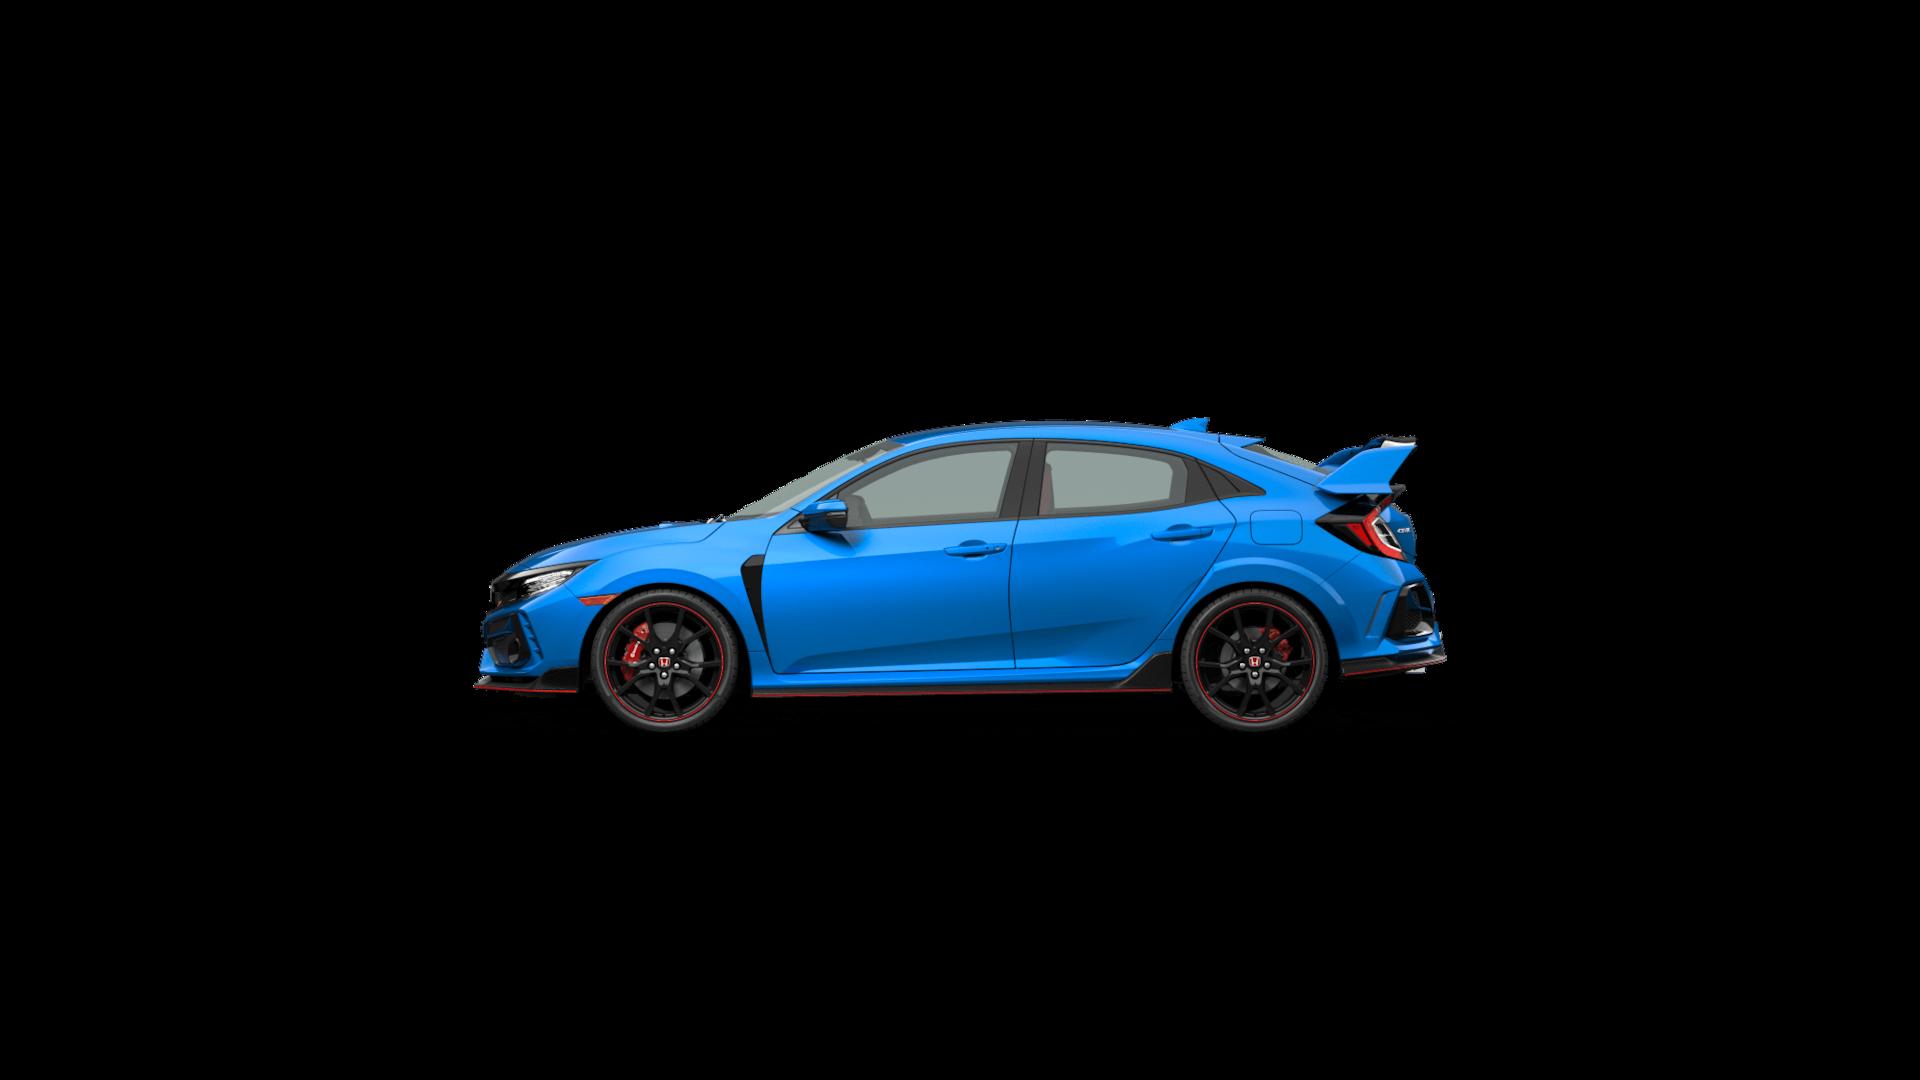 2020 Civic Type R Racing Inspired Redesigned Honda